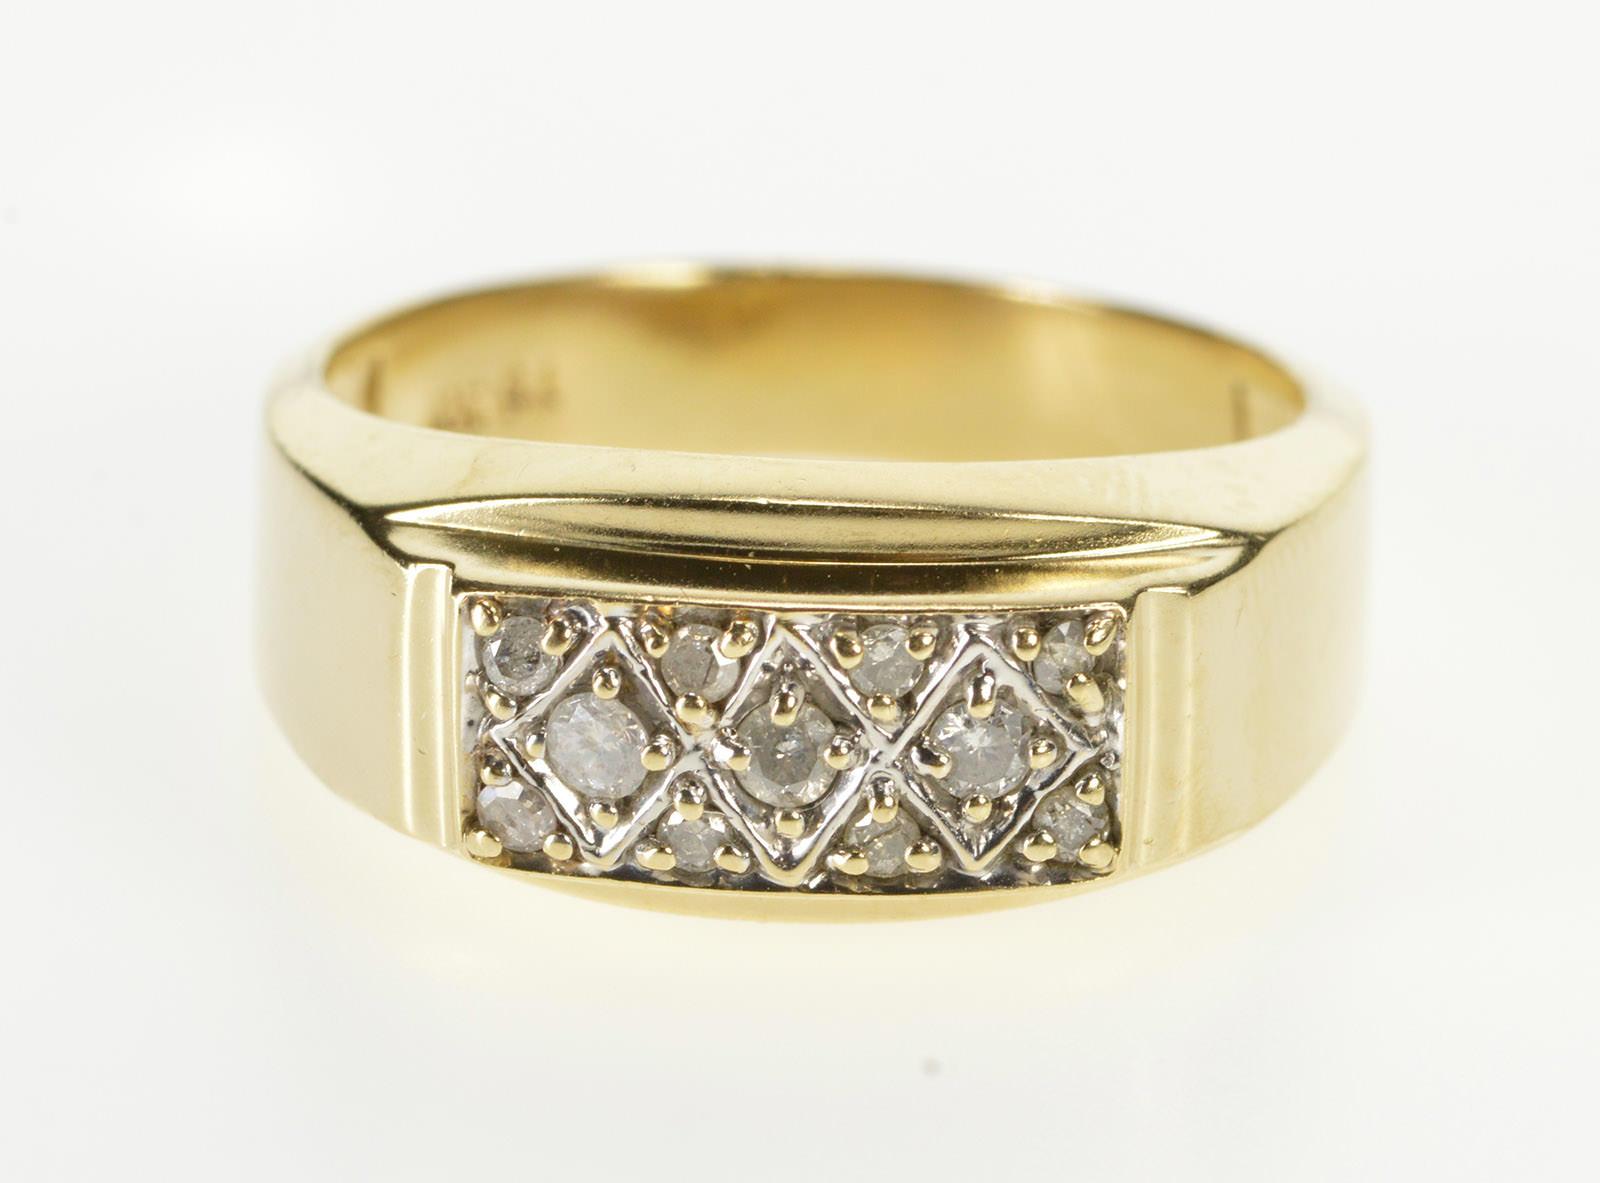 14K Diamond Inset Classic Men/'s Wedding Band Ring Size 10.25 Yellow Gold